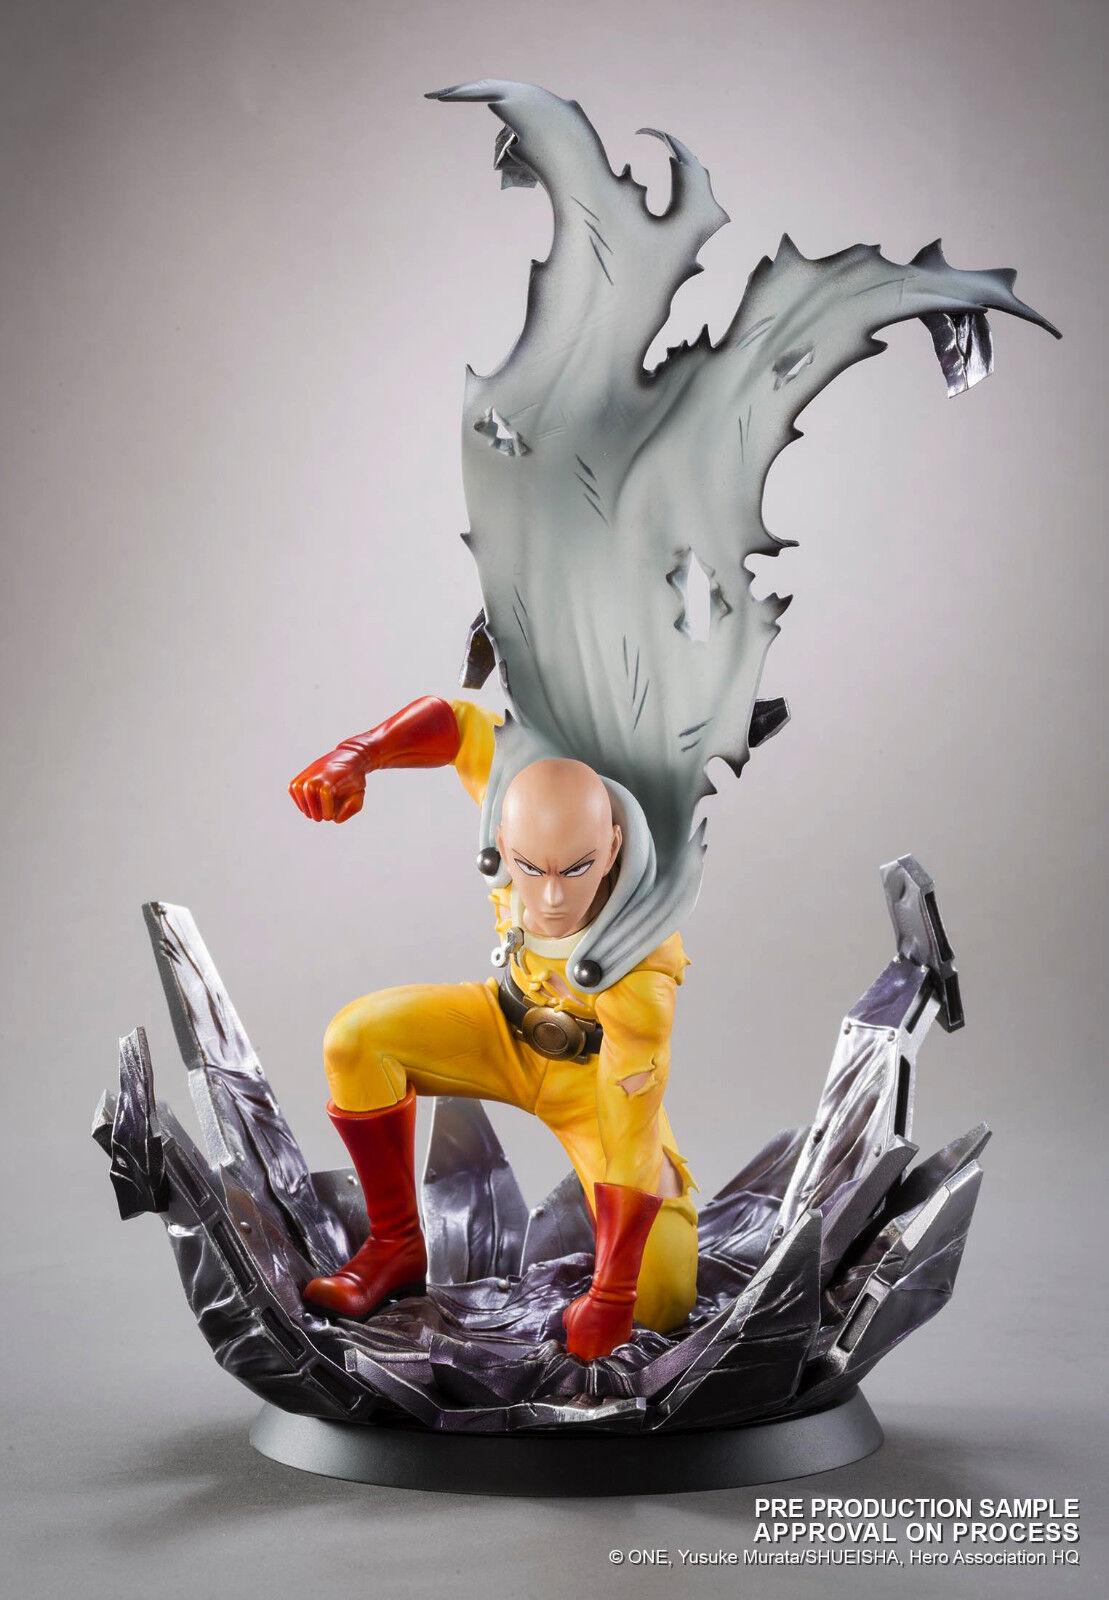 ventas en linea Tsume-Art Statua X-TRA Saitama One Punch Man 25 cm cm cm subito disponibile  ORIGINALE  Mejor precio